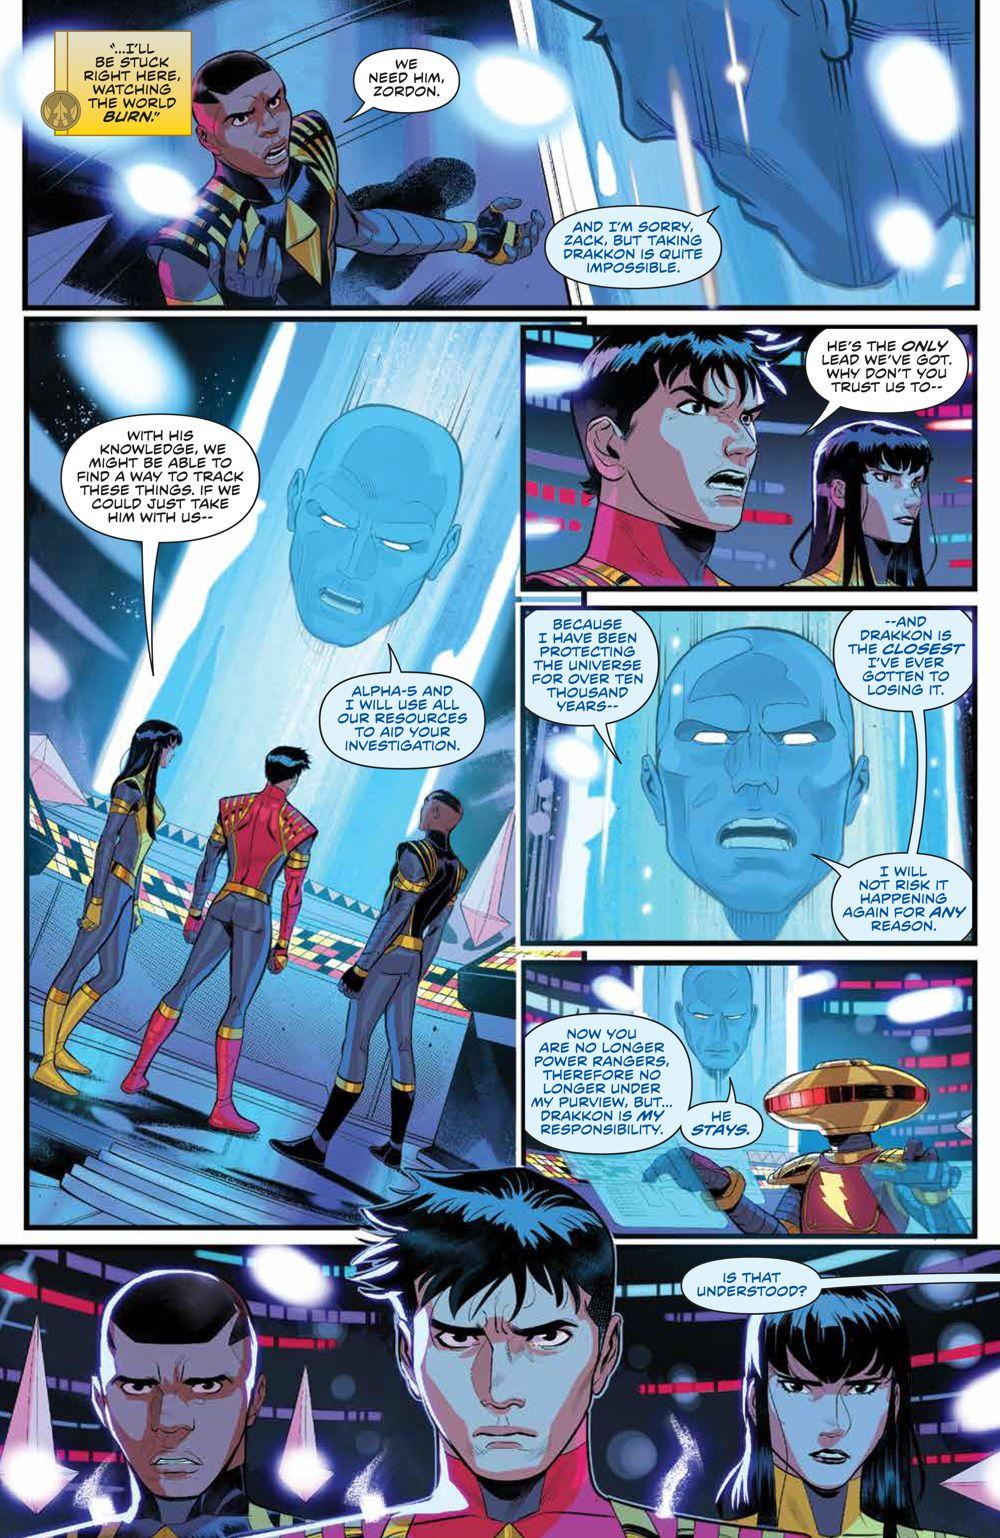 PowerRangers_v1_SC_PRESS_17 ComicList Previews: POWER RANGERS VOLUME 1 TP